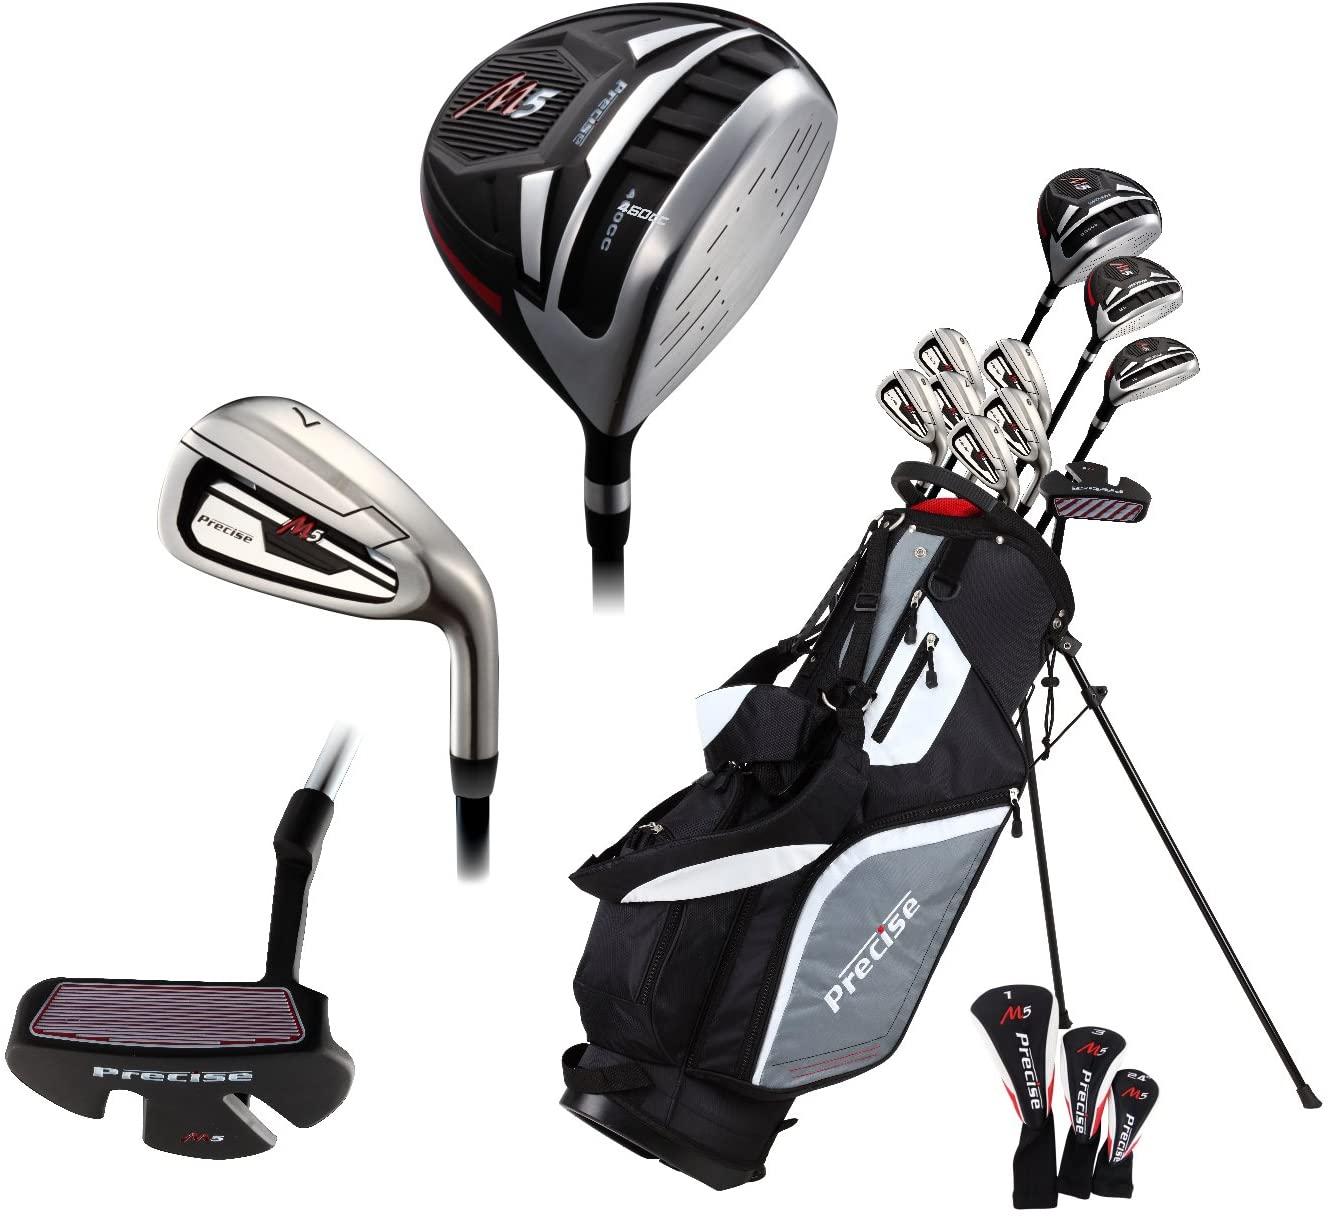 5 Best Golf Club Sets for Senior Men -14 Piece Men's All Graphite Senior Complete Golf Clubs